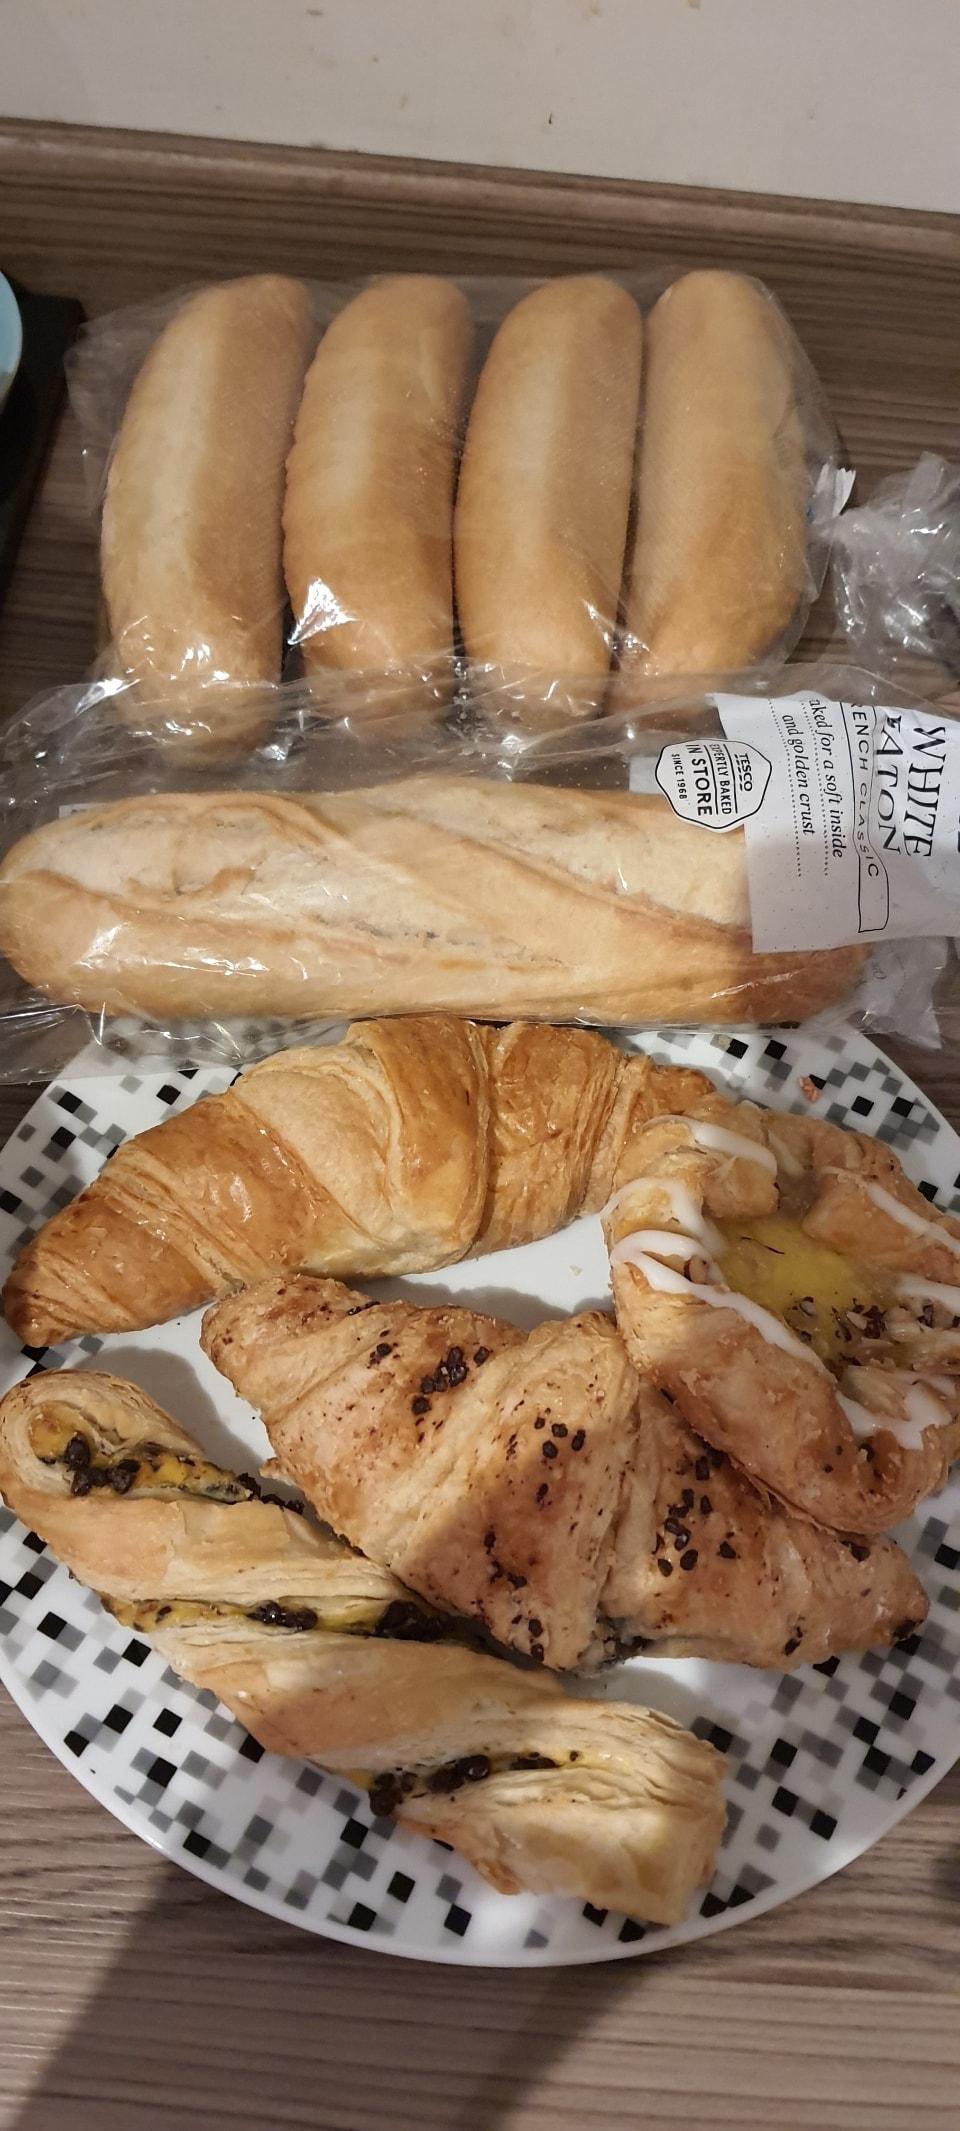 mixed bread and bakery